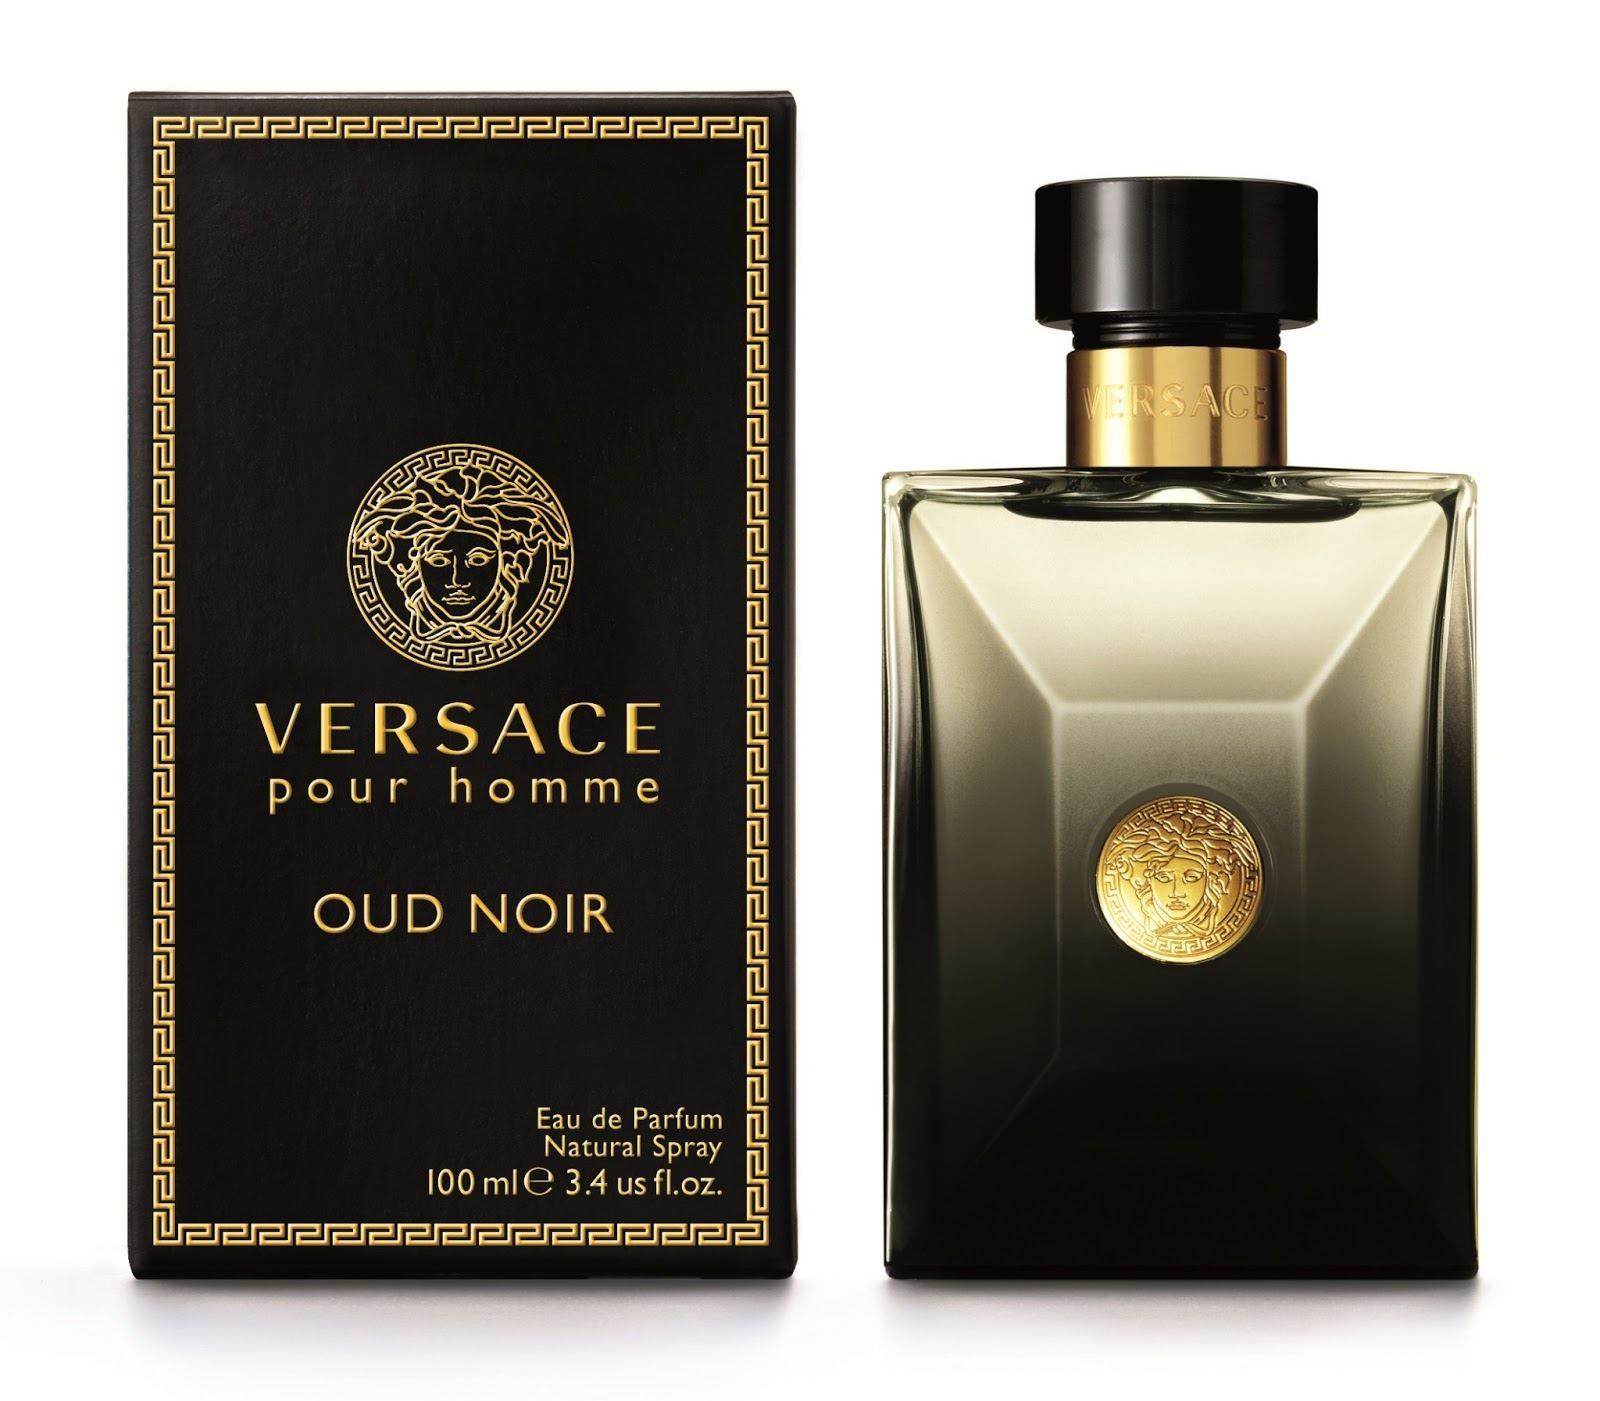 Details zu Versace Oud Noir Eau De Parfum For Men Spray 100 ml 3.4 fl.oz